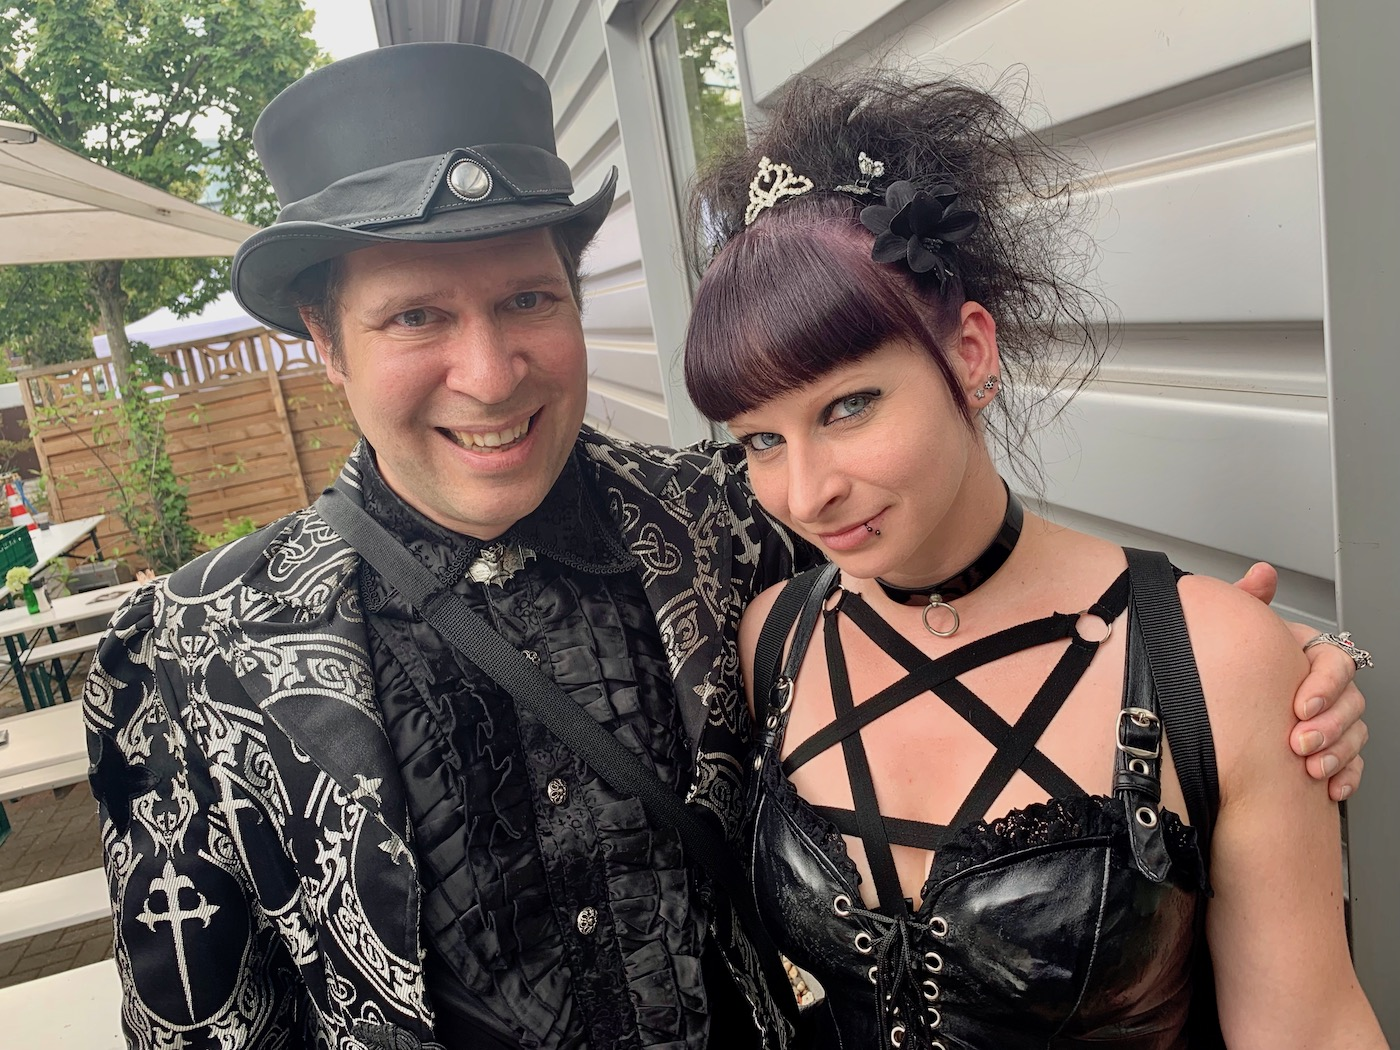 mark_benecke_amphi_festival_koeln_2019 - 24.jpg